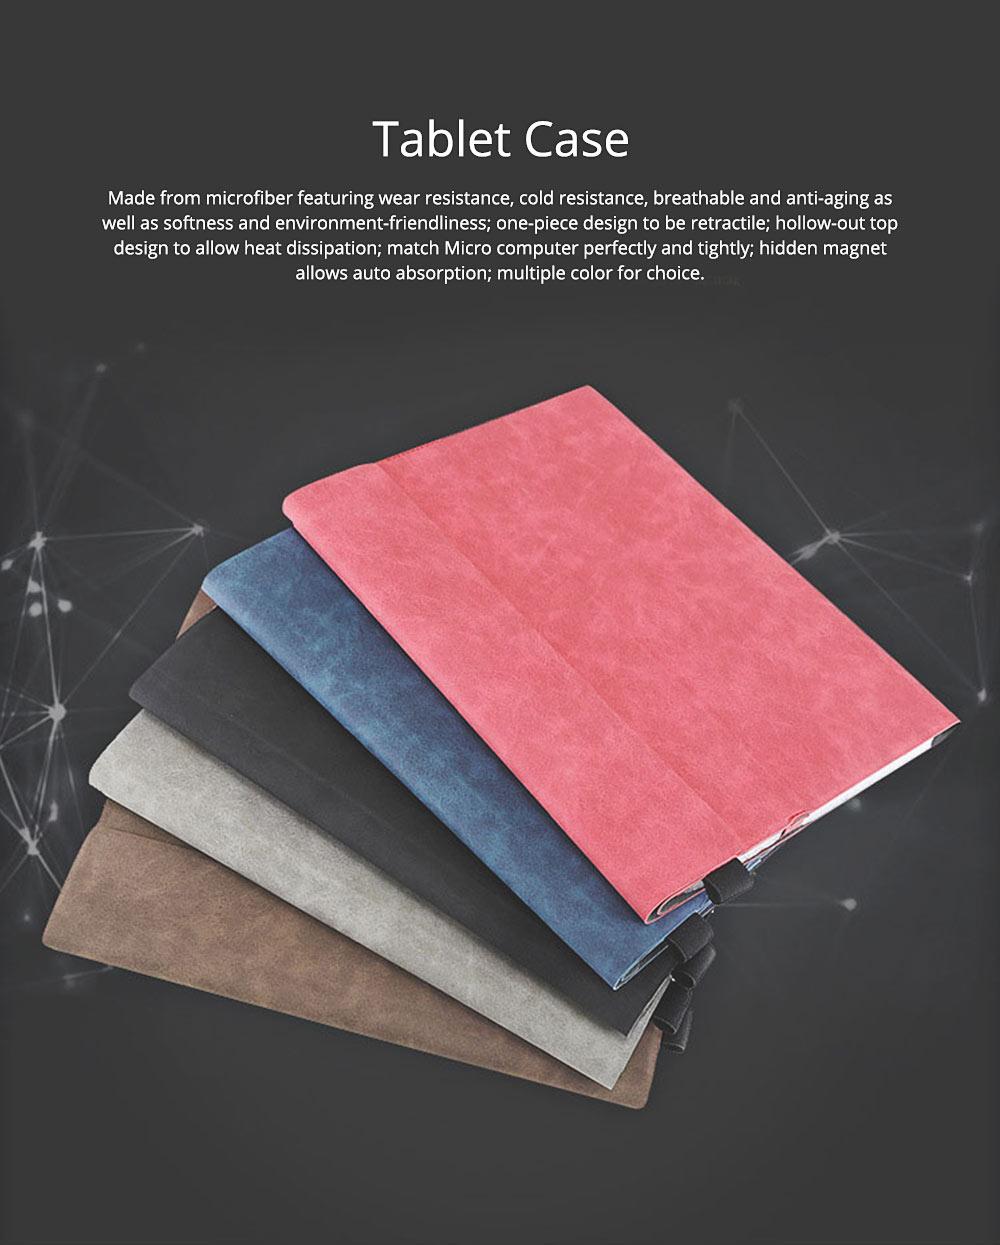 Laptop Case Pack for Microsoft Surface Pro 4, Surface Pro 3, Surface Pro 5, Surface Pro 6 Full Protective Pouch Case, Tablet PC Laptop Case 0